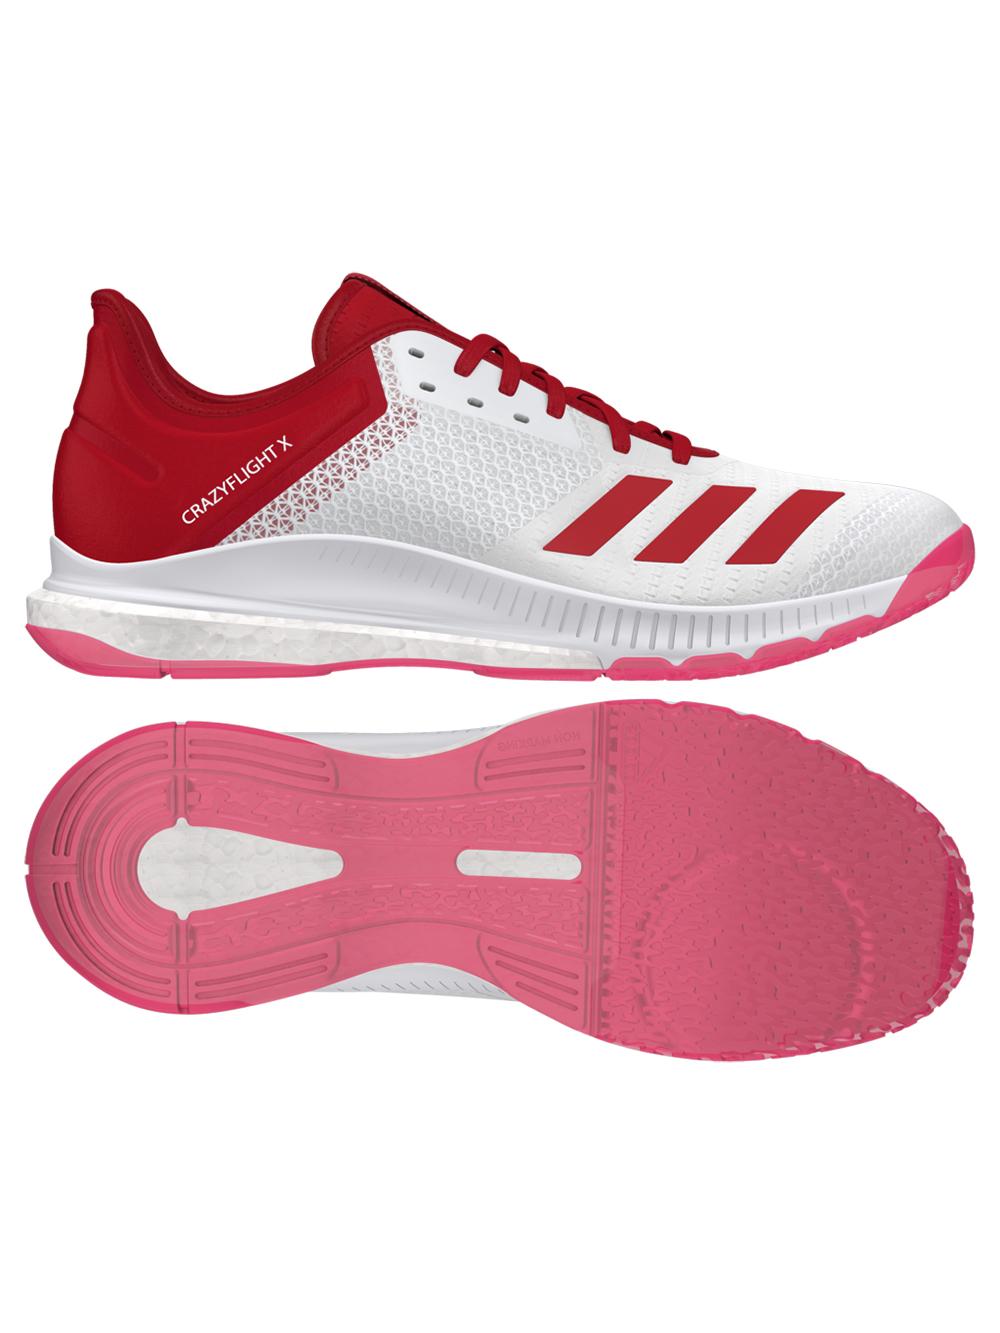 Adidas Crazyflight X3 Shoes - White/Red